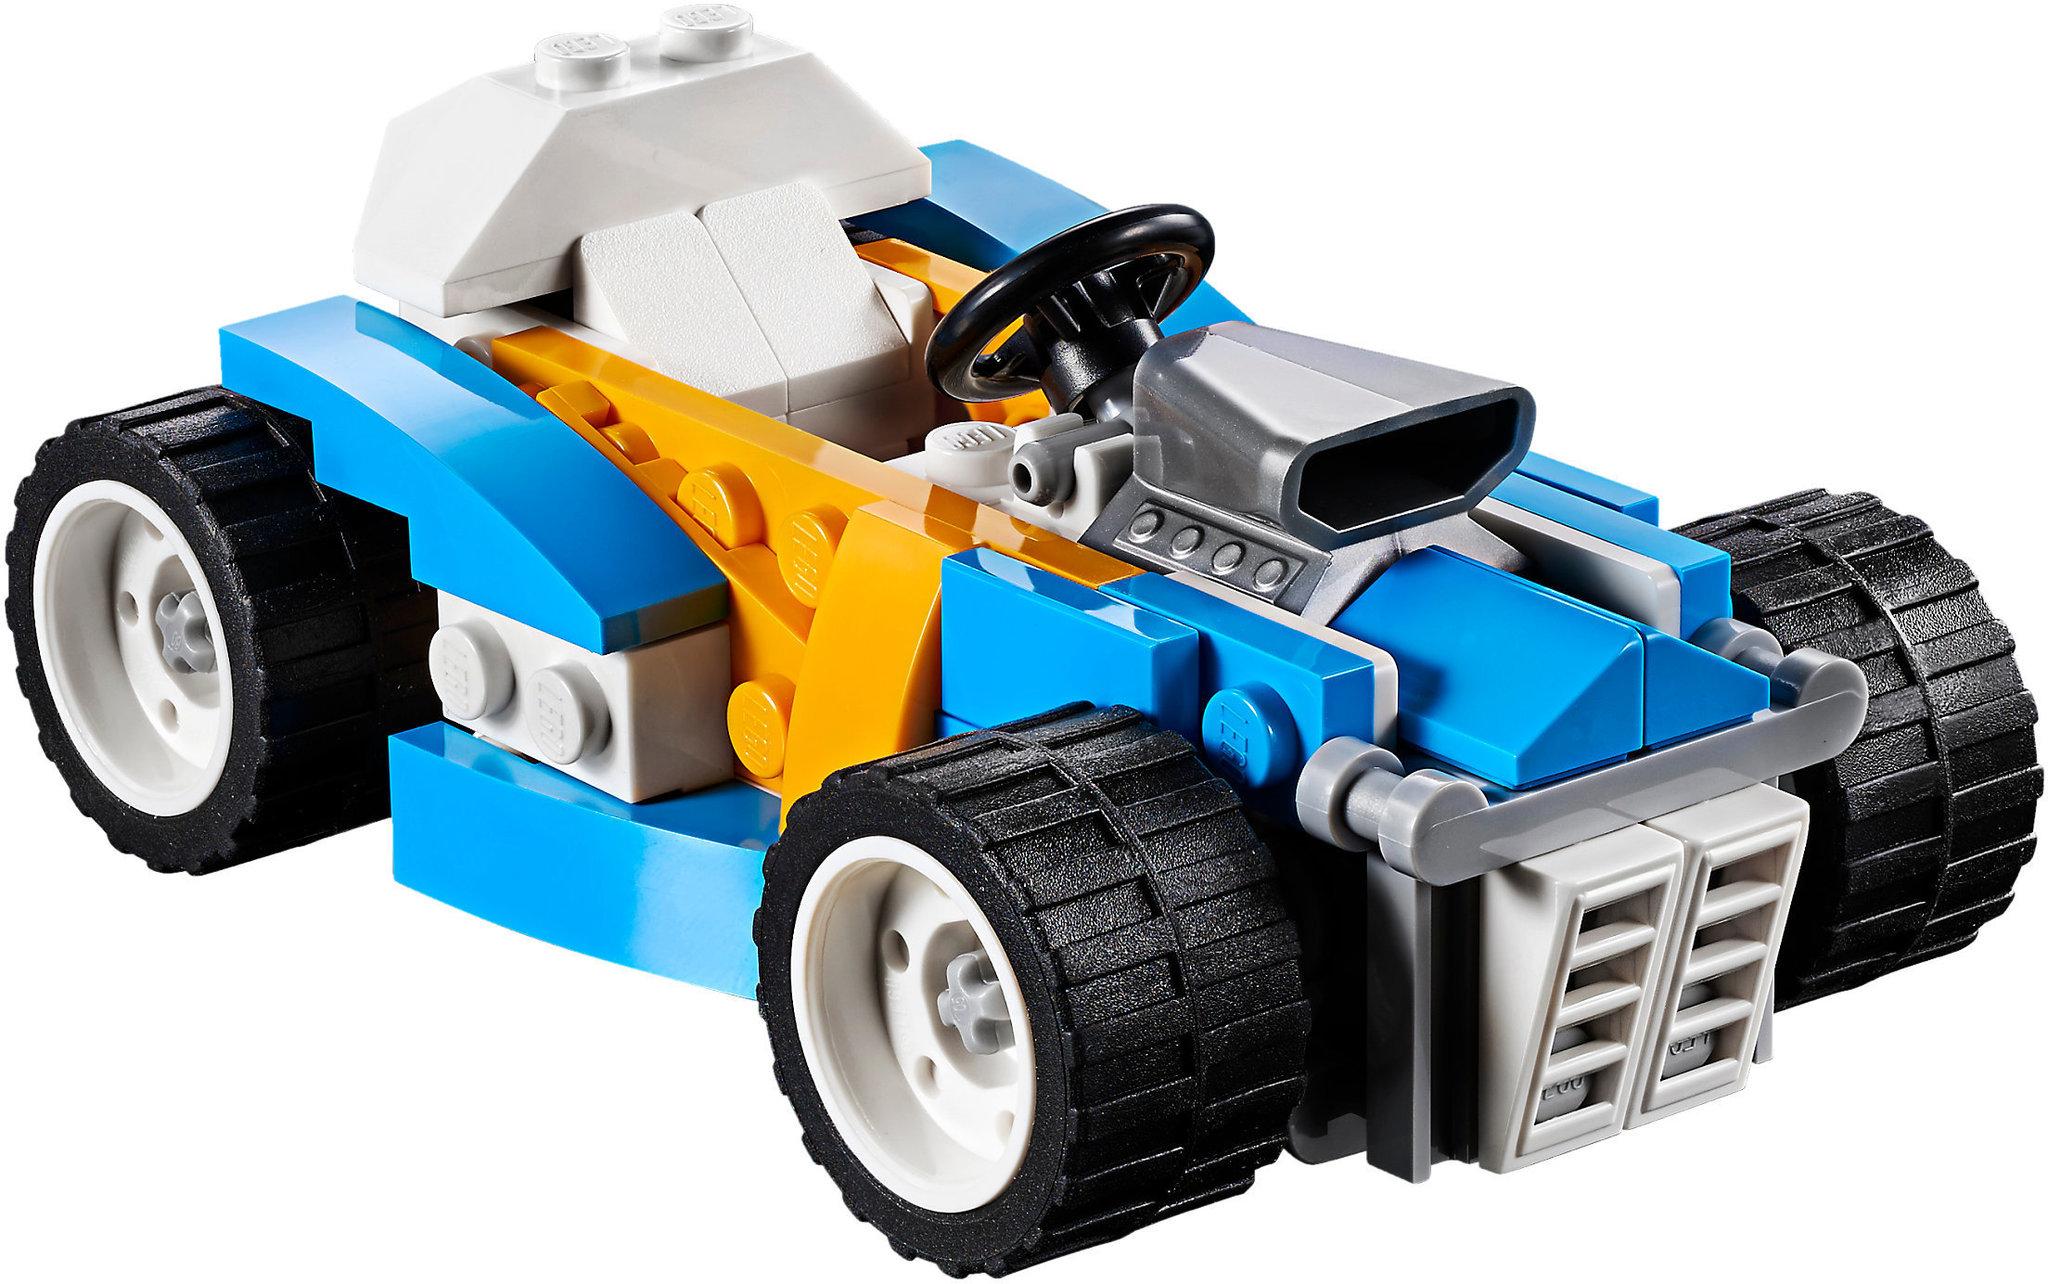 LEGO Creator Extreme moteurs Set 31072 BRAND NEW